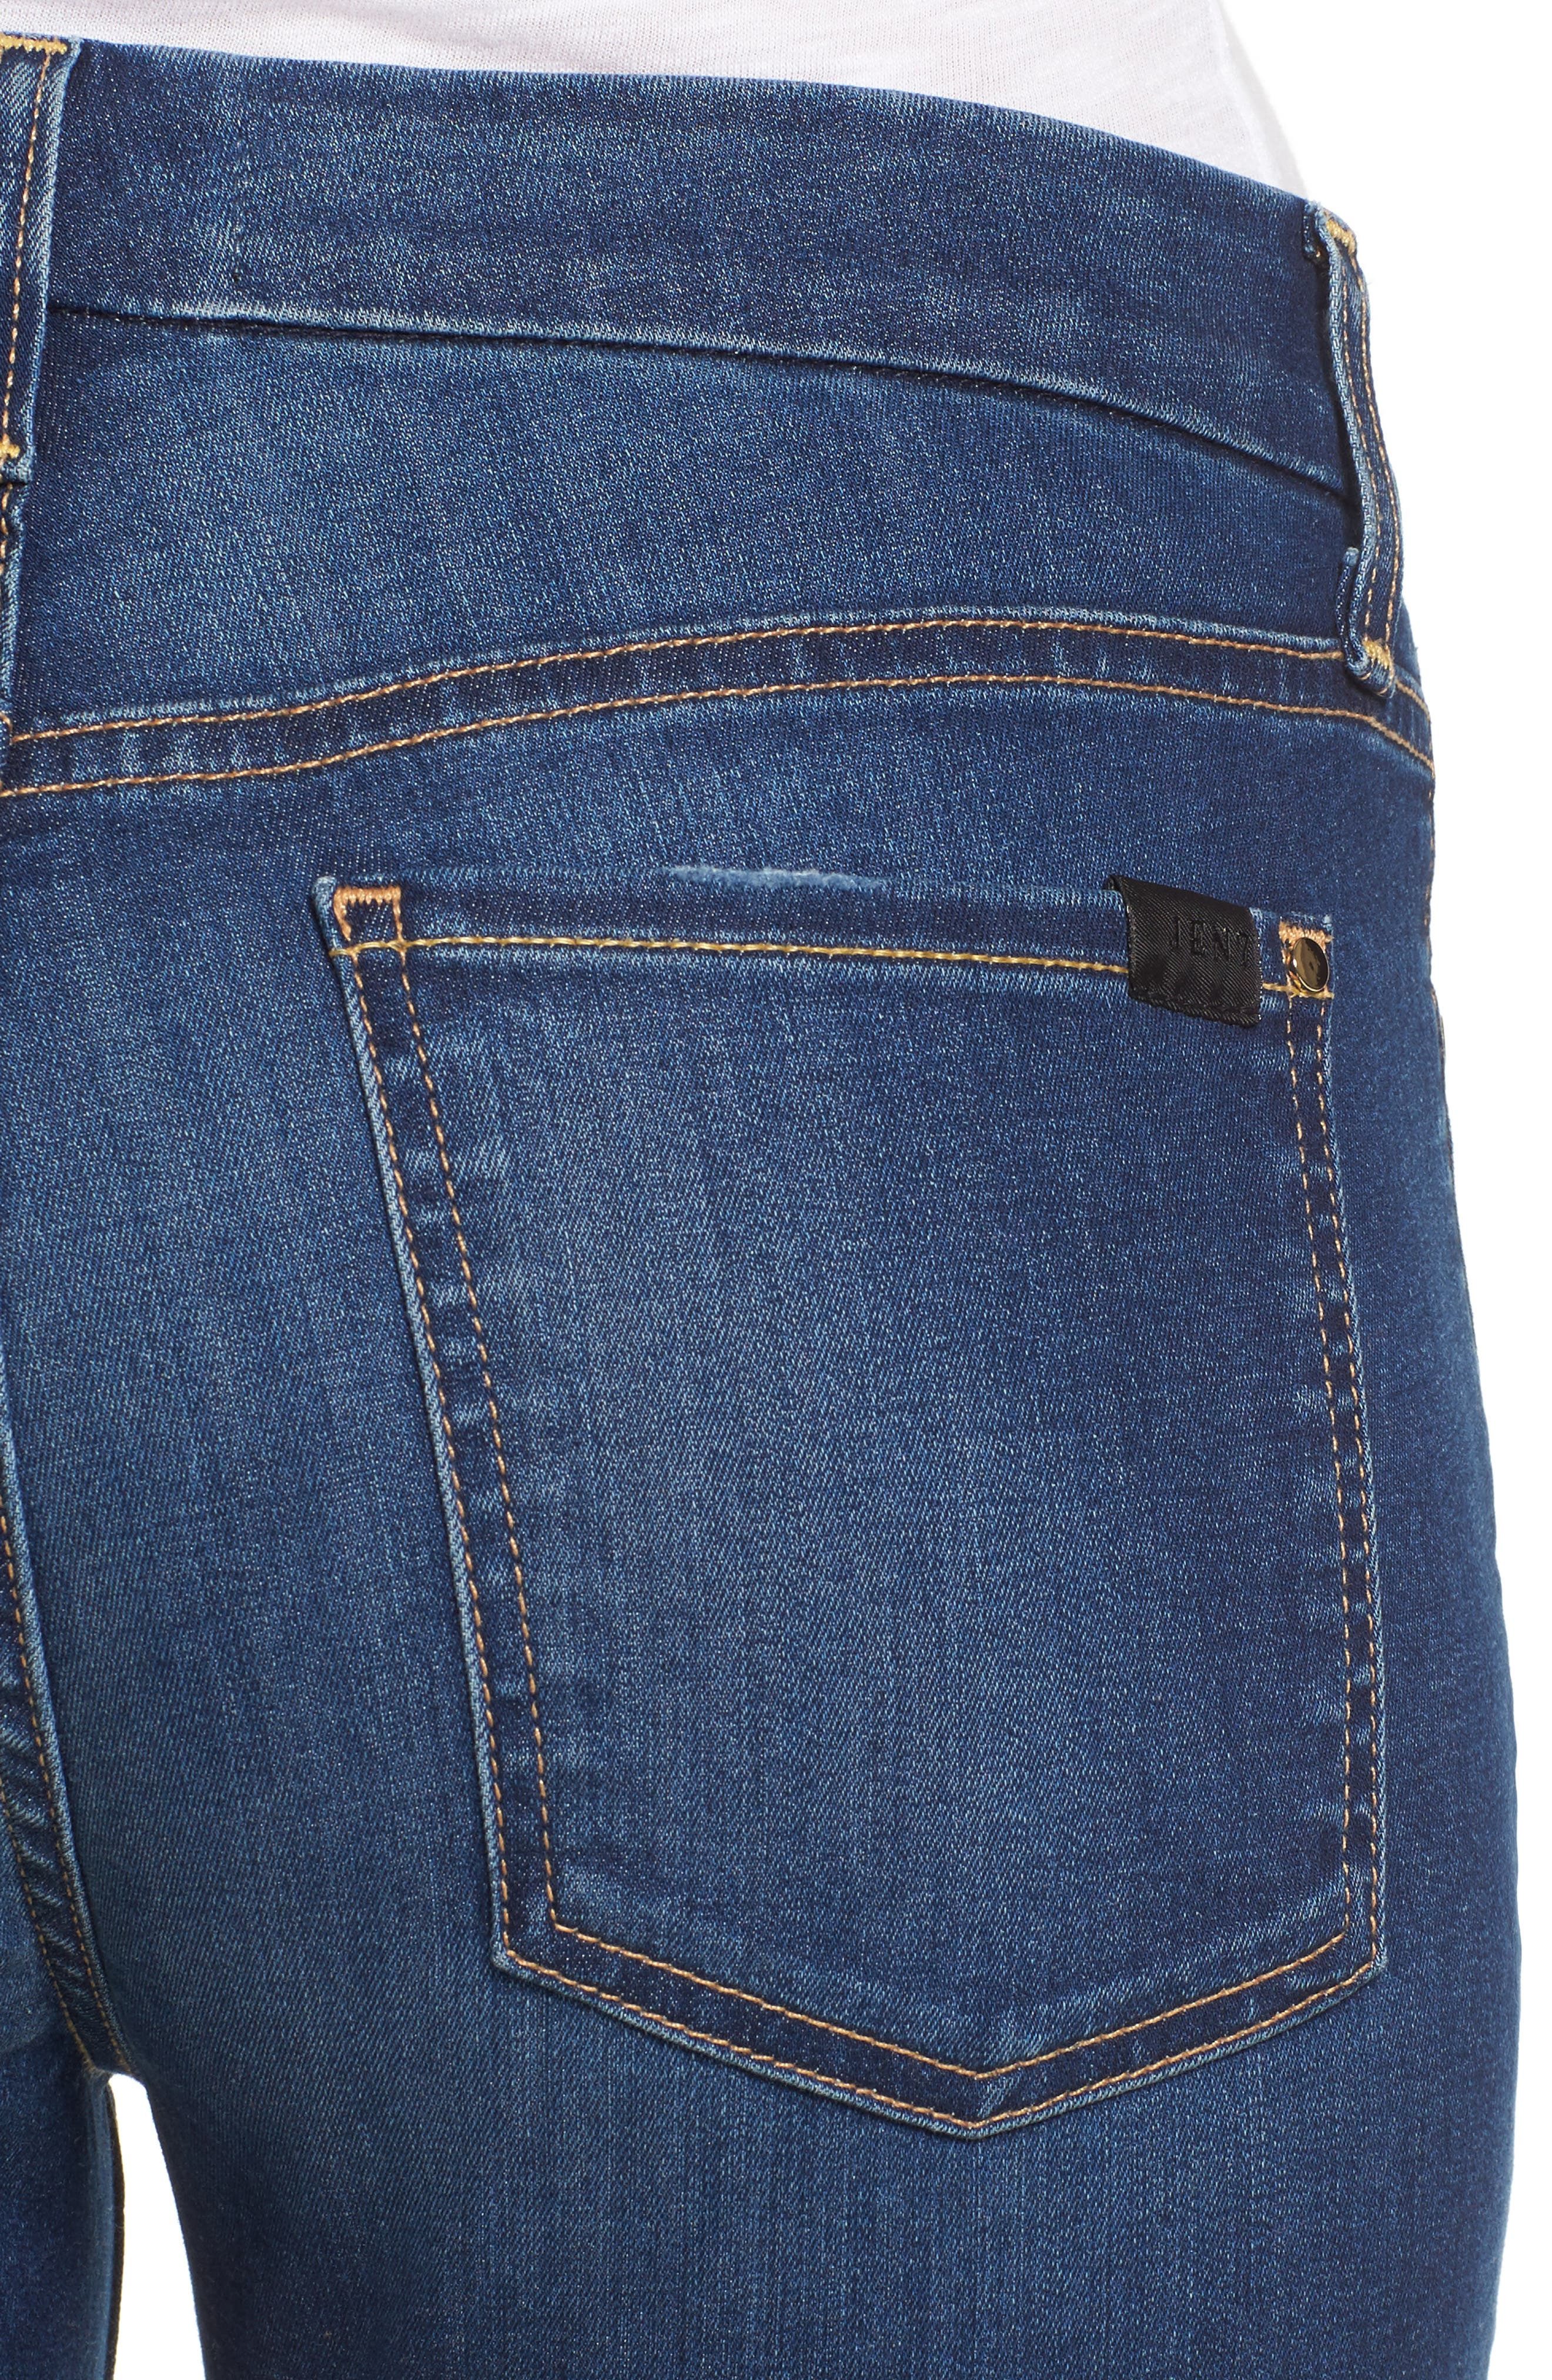 Release Hem Skinny Ankle Jeans,                             Alternate thumbnail 4, color,                             401